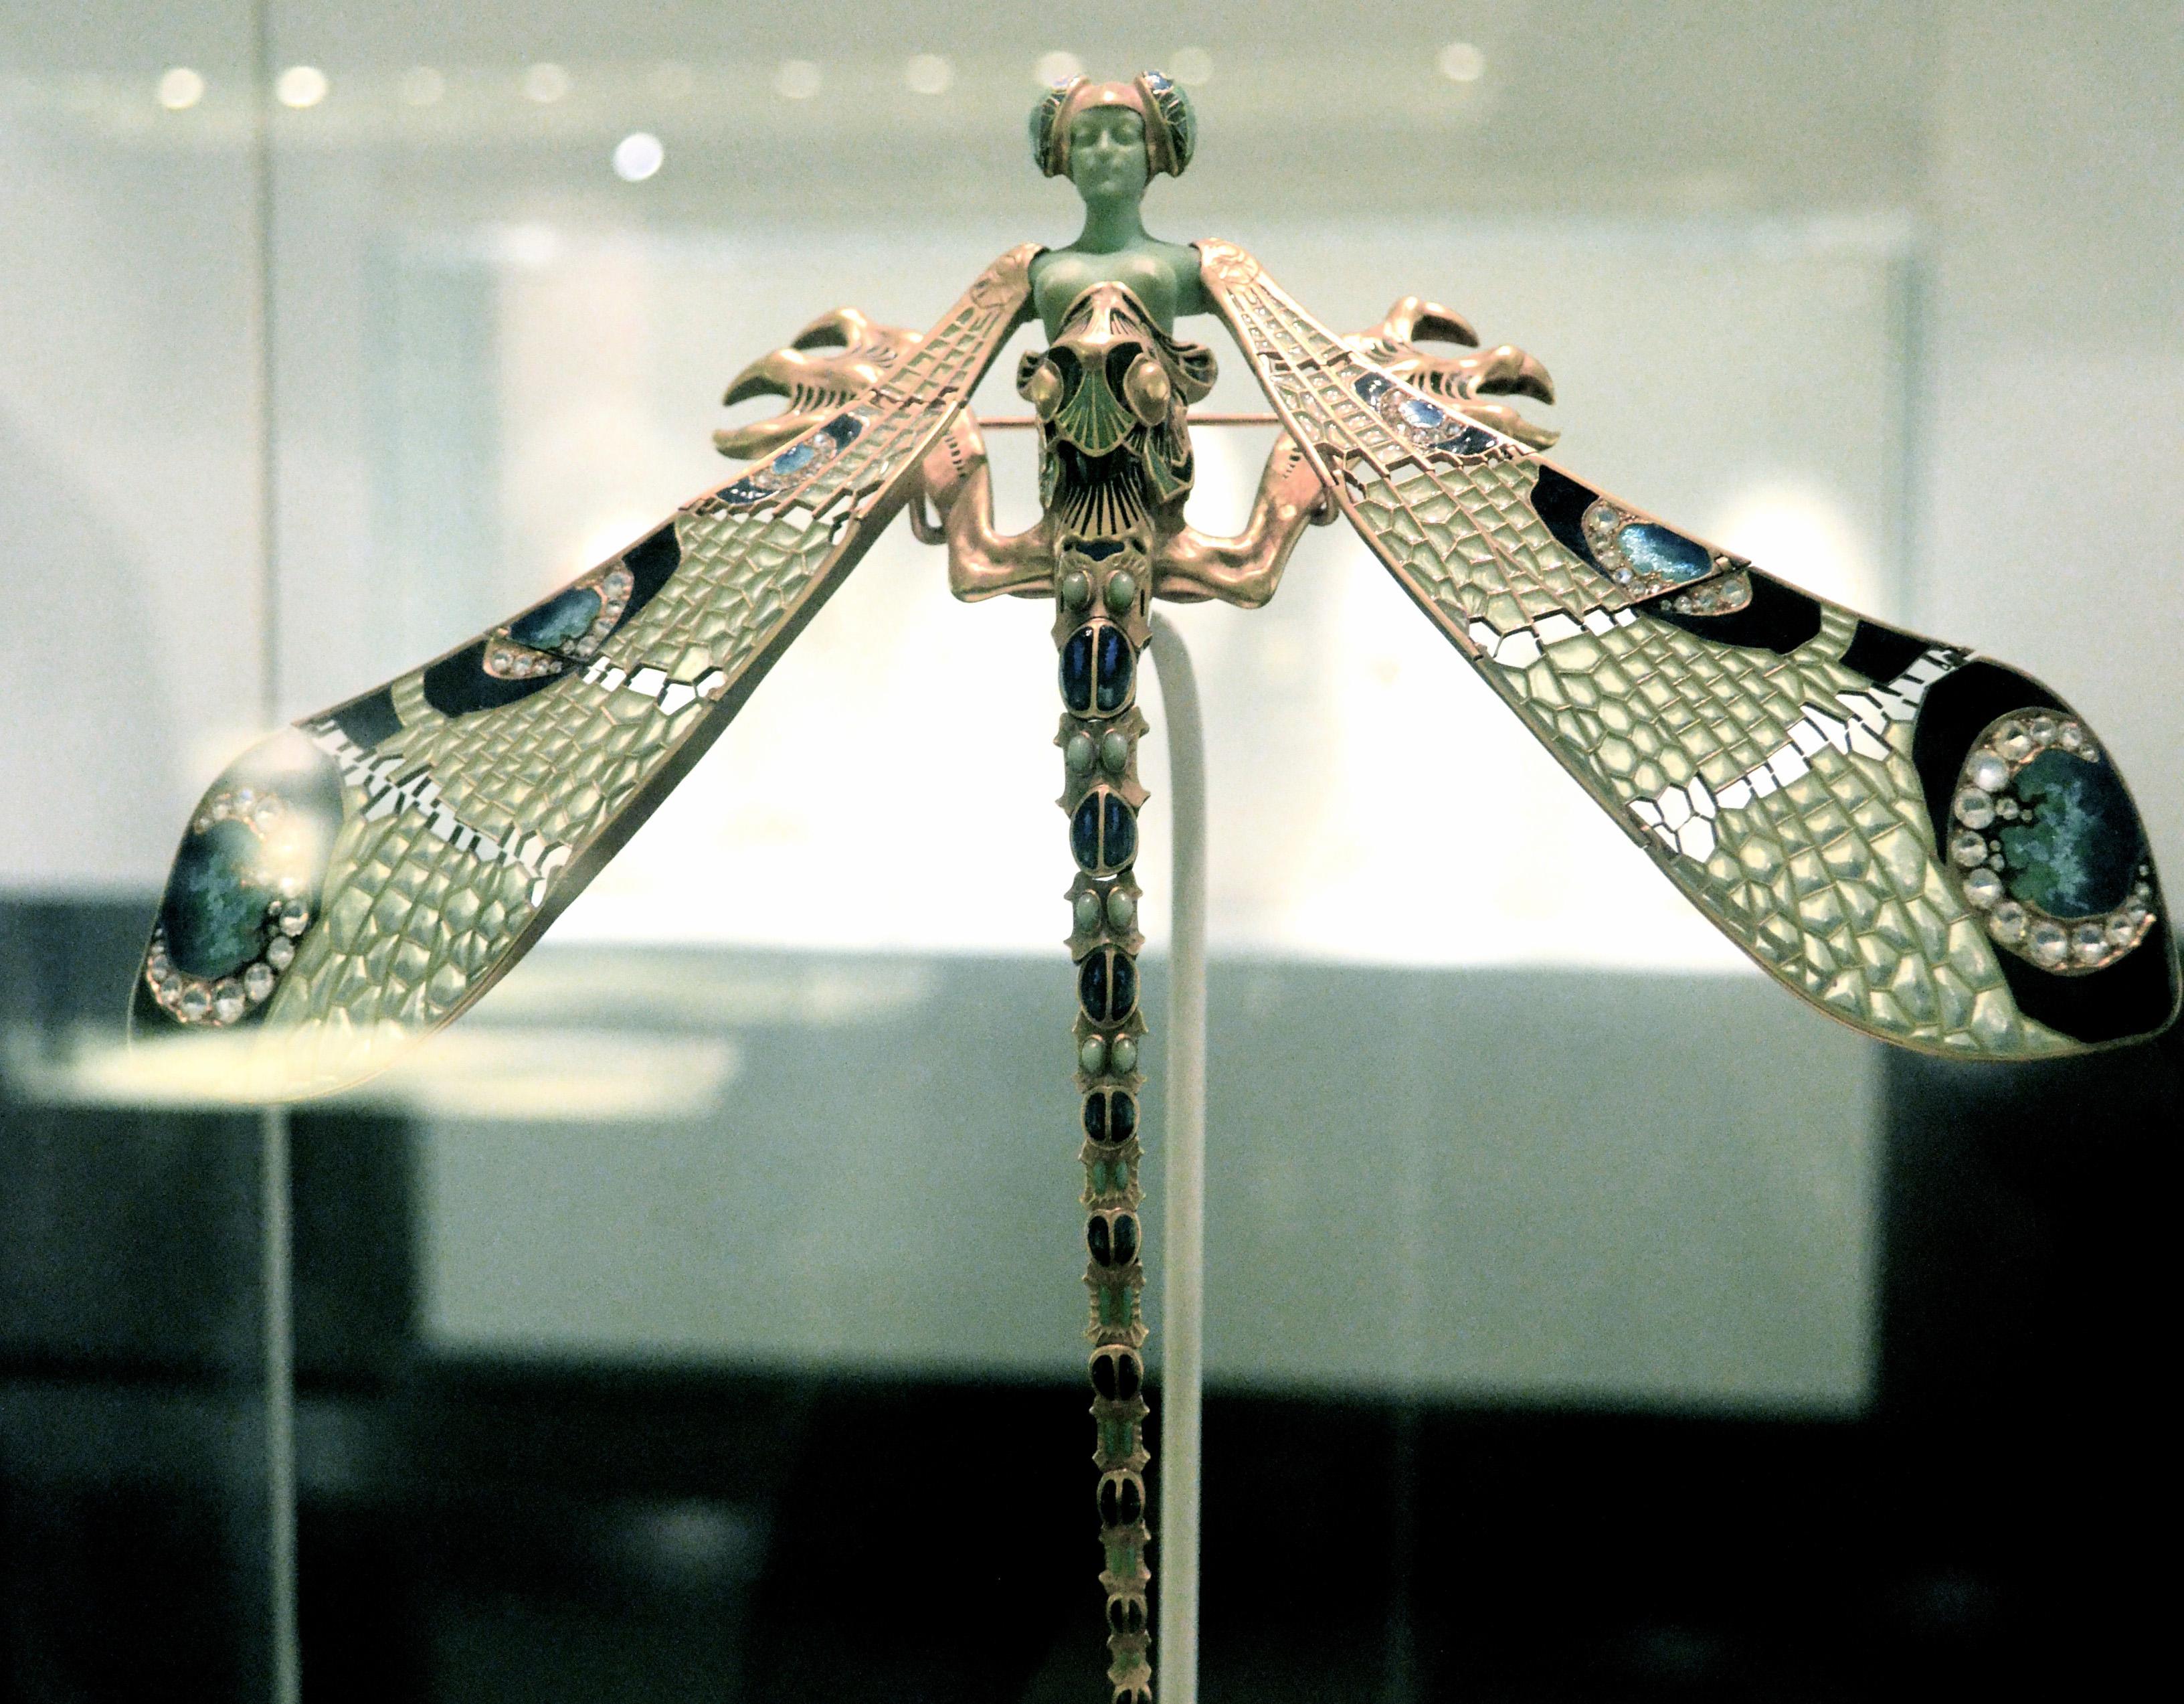 Pectoral 'dragonfly' brooch c. 1897-98 worn by Sarah Bernhardt, Museu Calouste Gulbenkian | © Barbara Boumaraf-Tissier